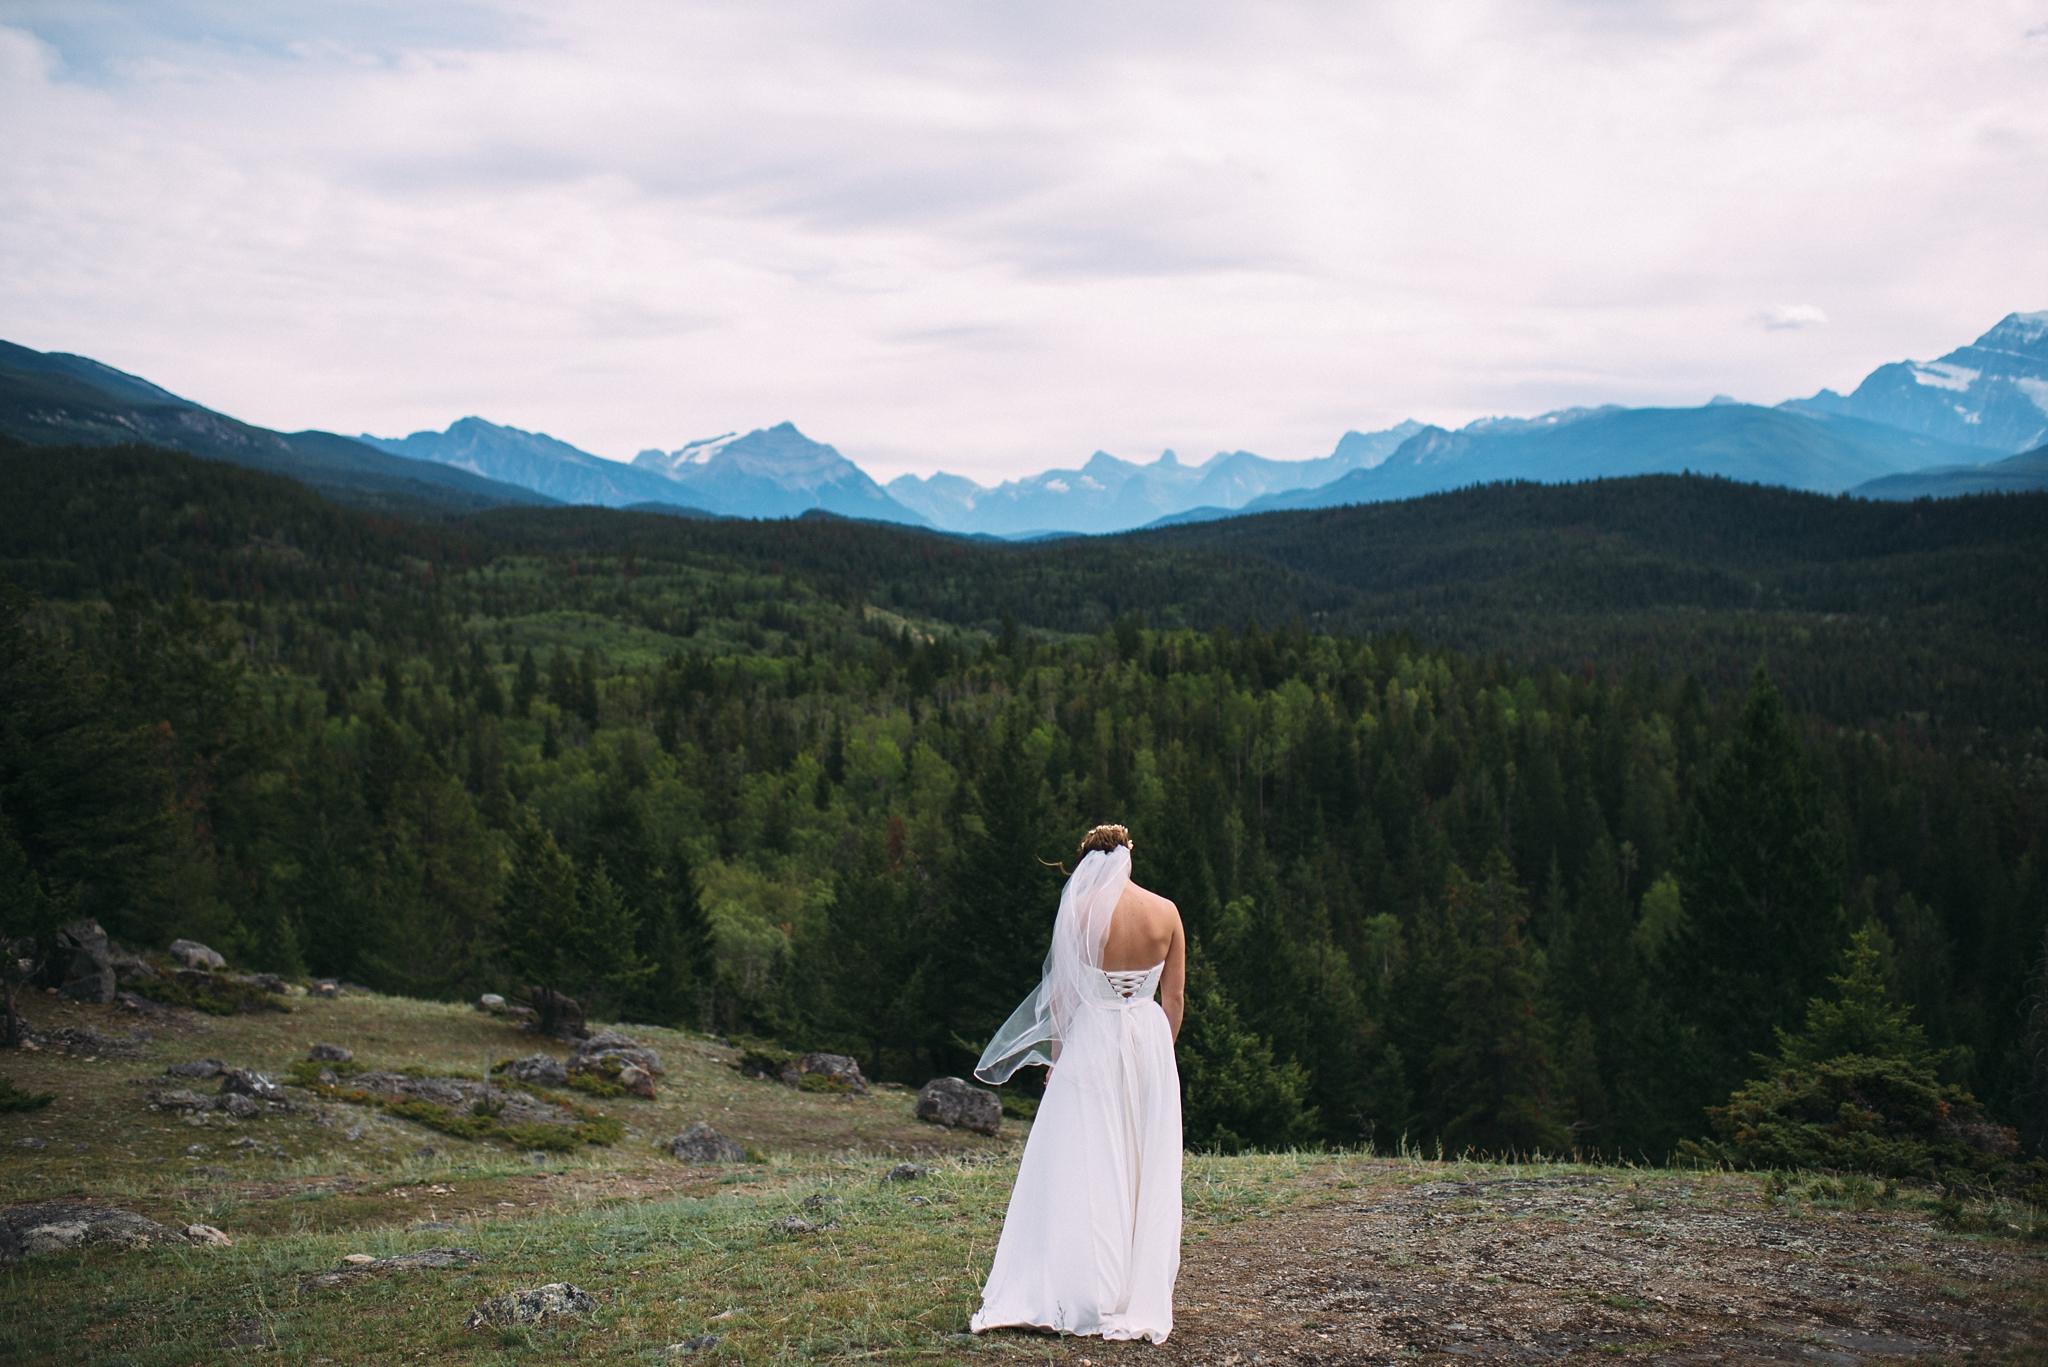 kaihla_tonai_intimate_wedding_elopement_photographer_2468